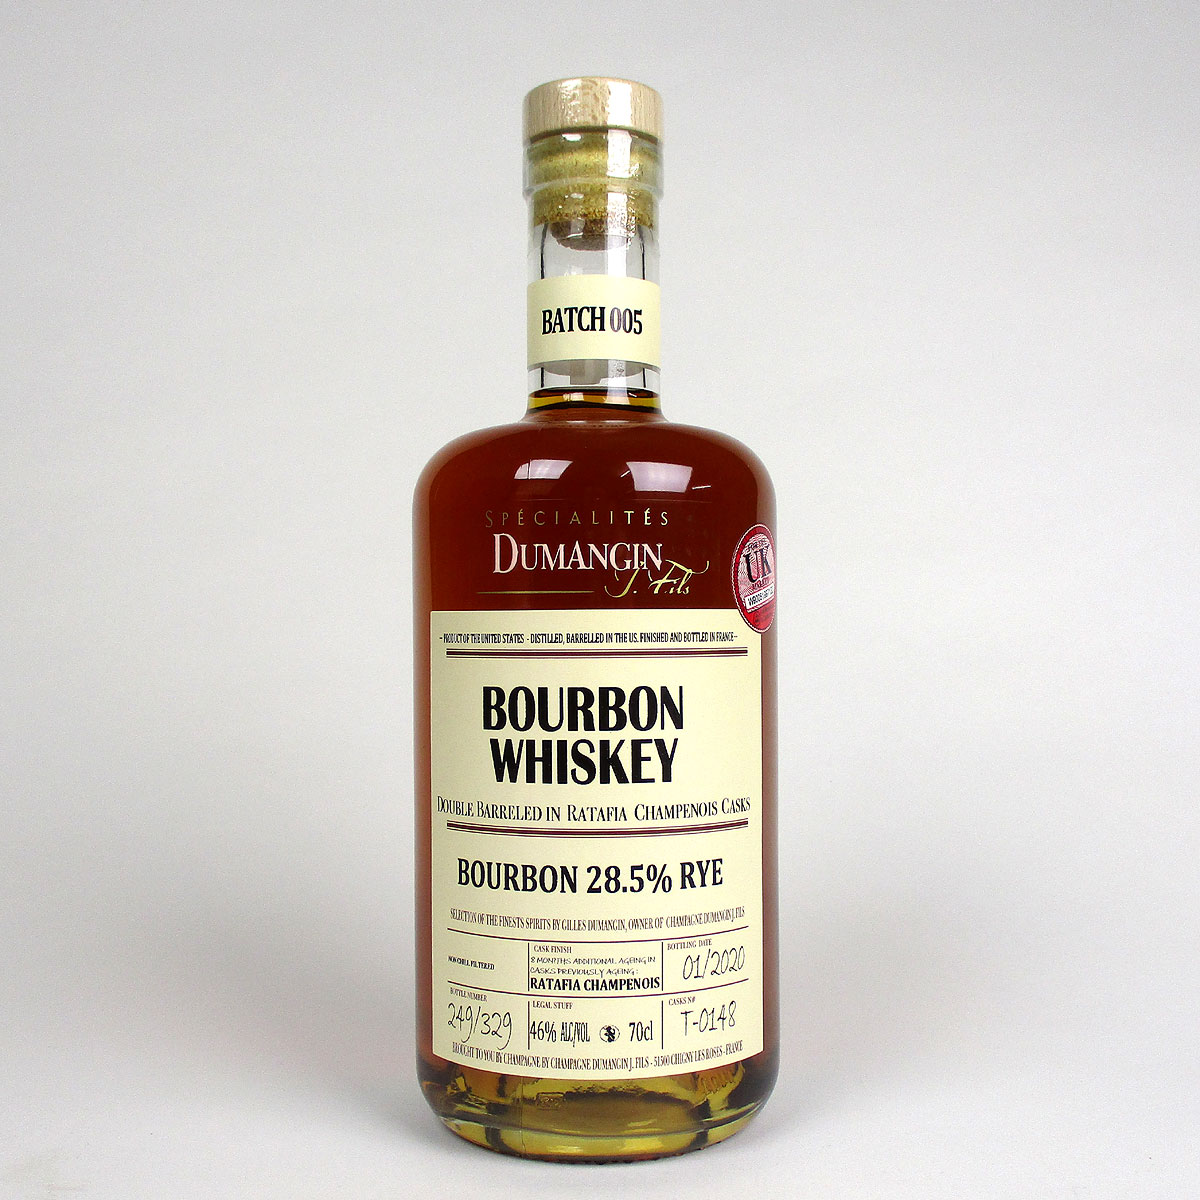 Rye Bourbon Whiskey: Spécialités Dumangin - Bottle